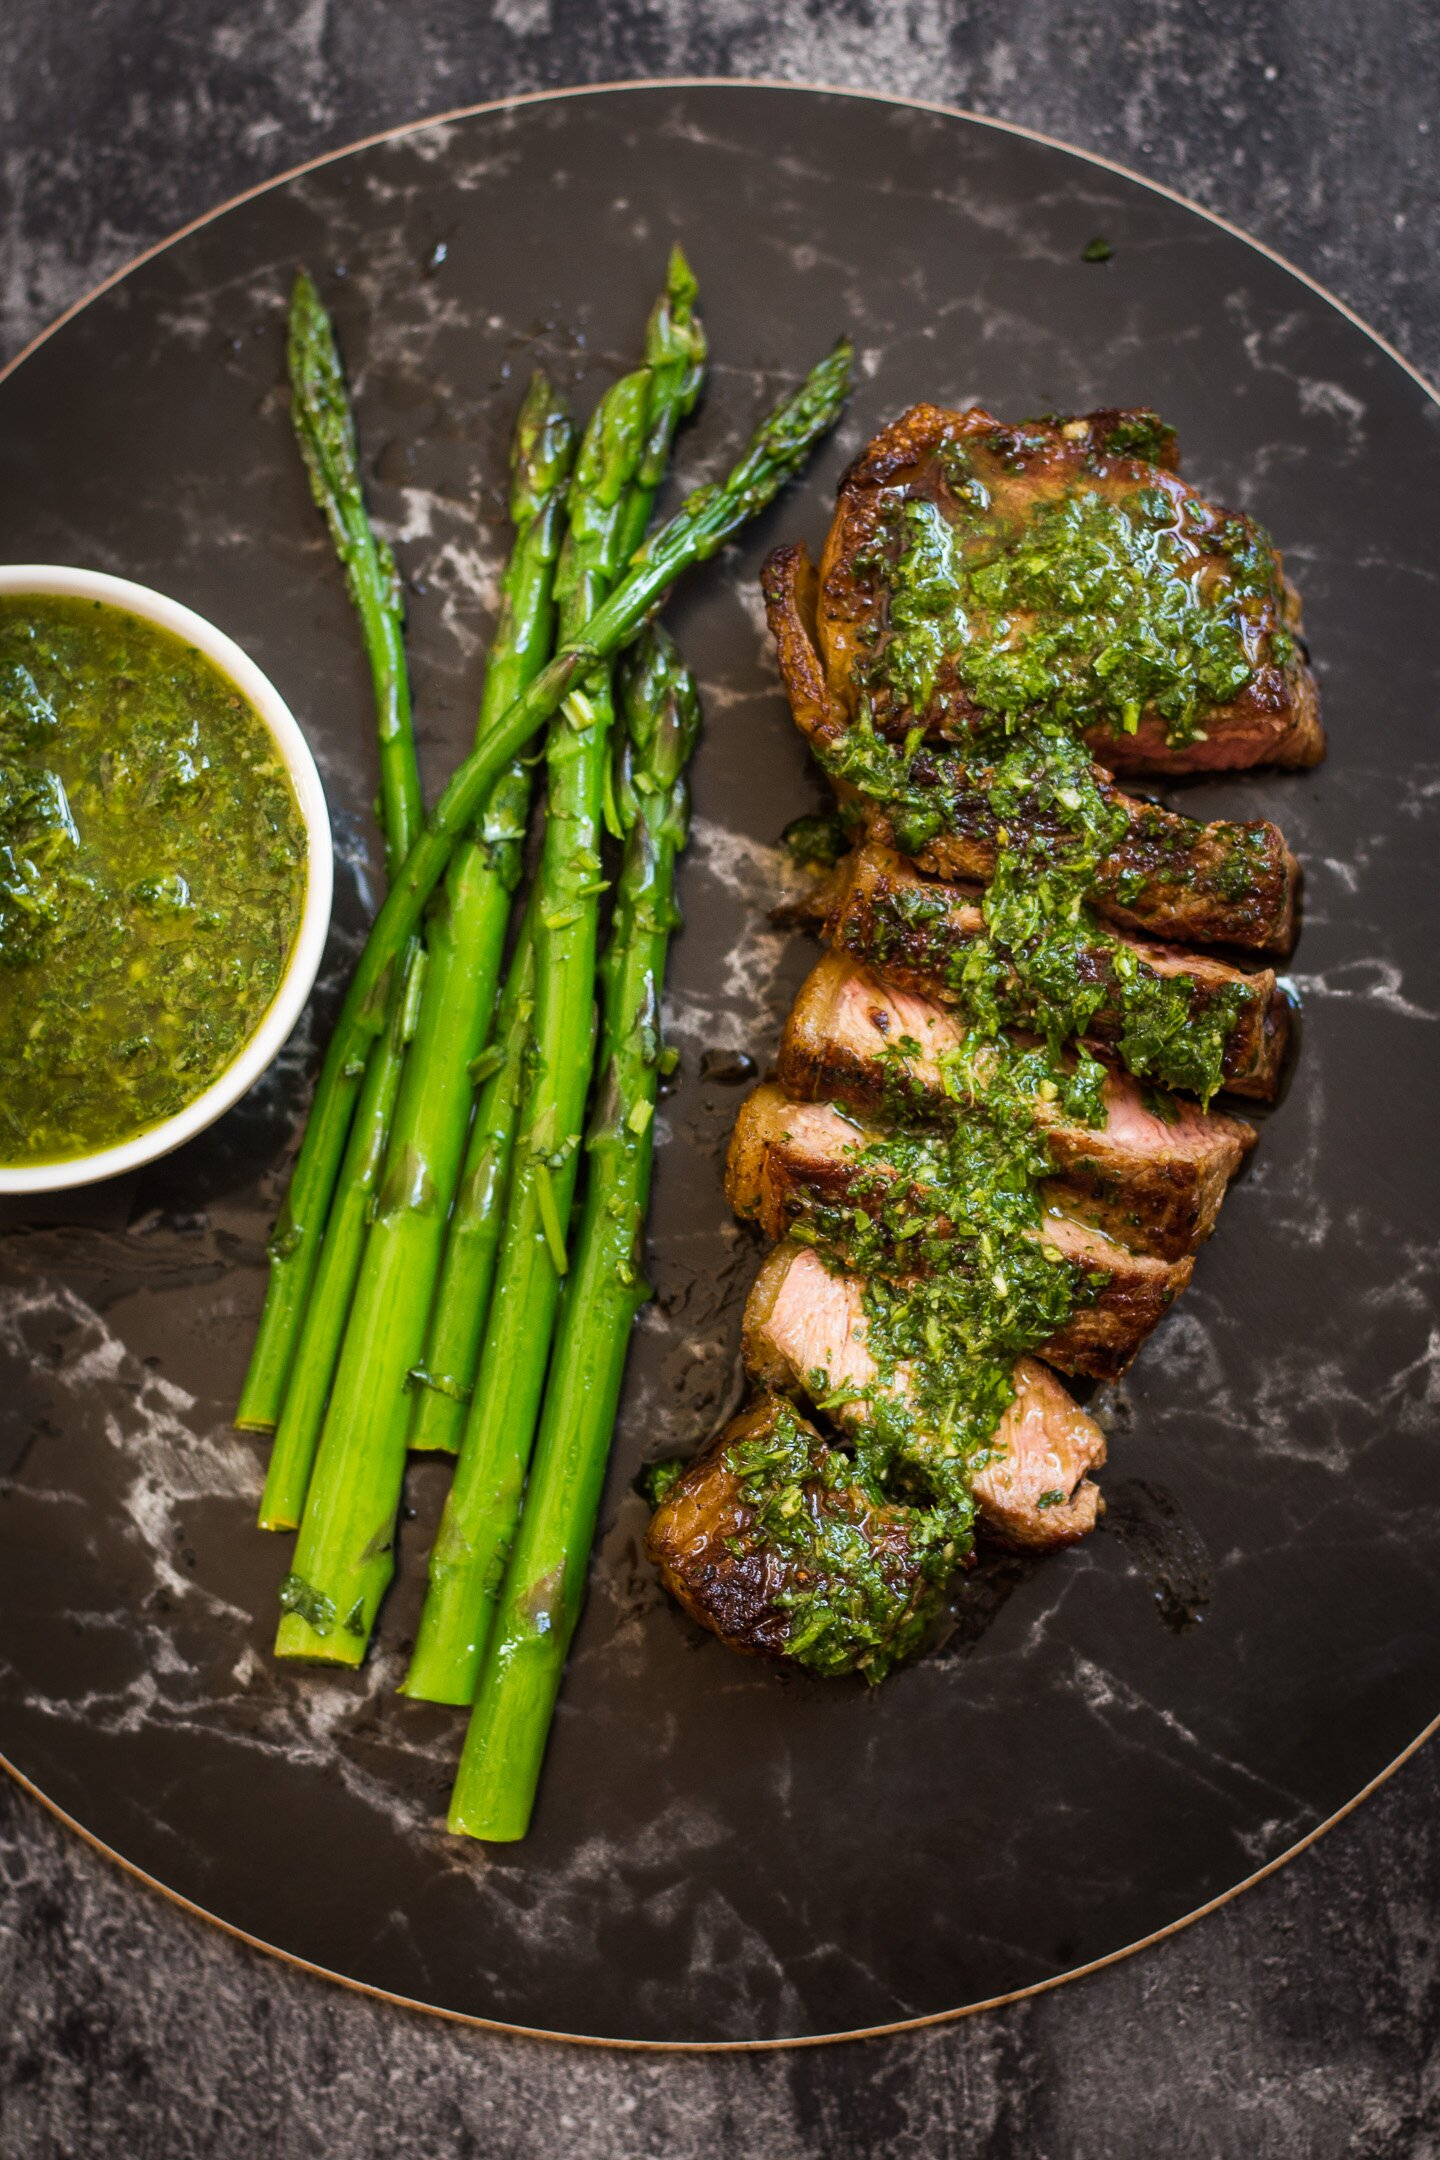 steak-with-chimichurri-sauce-recipe-2